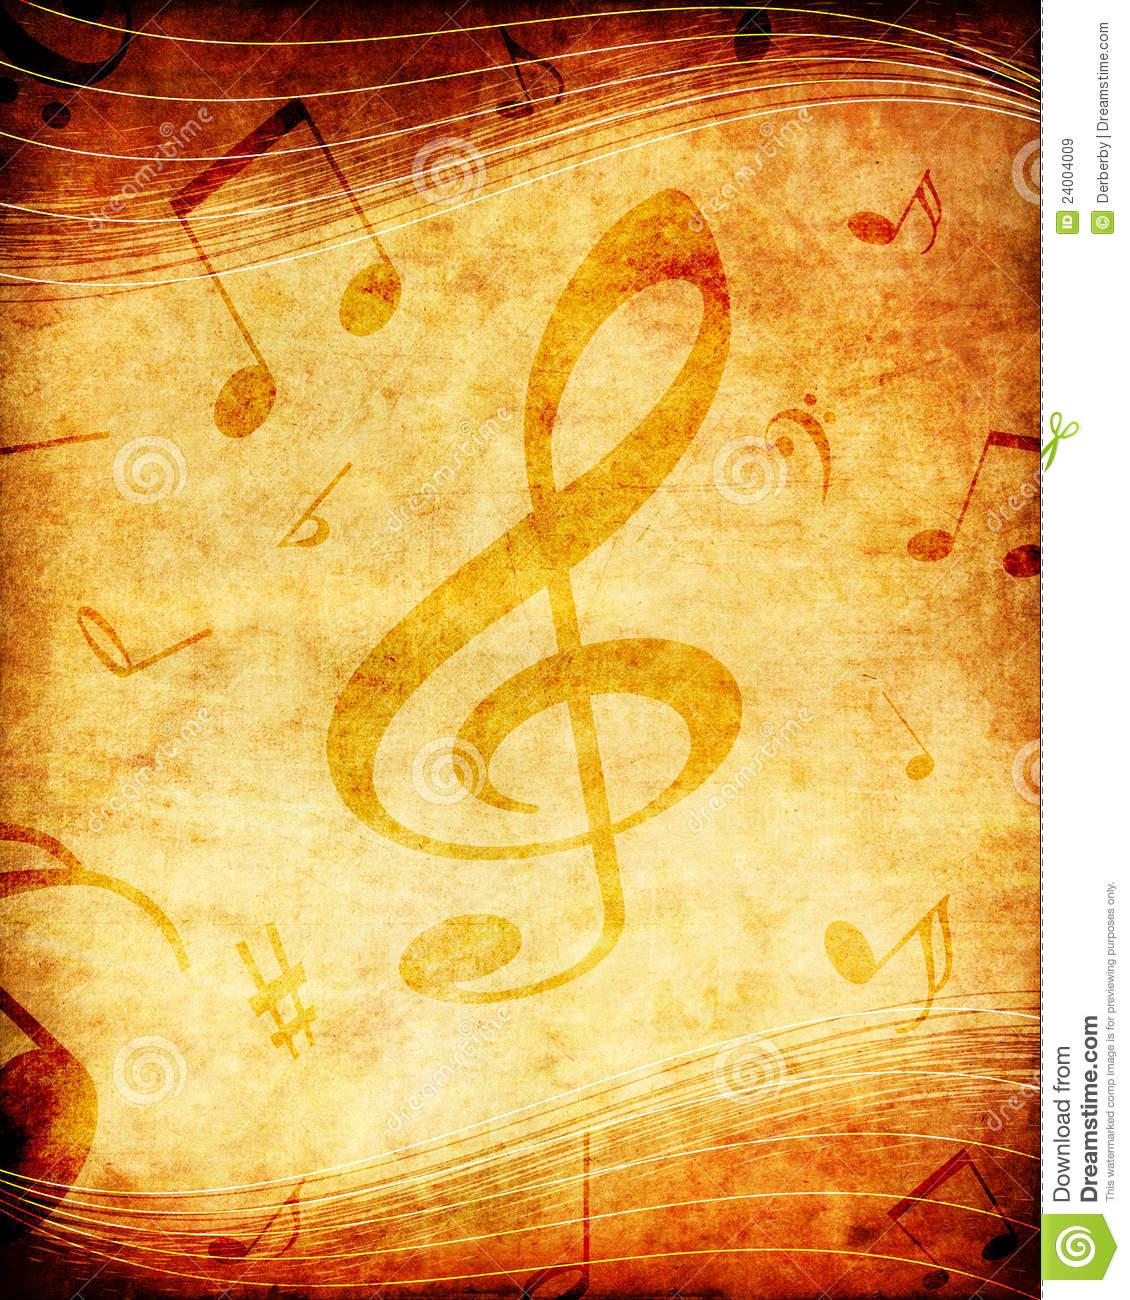 classic music wallpaper - photo #18